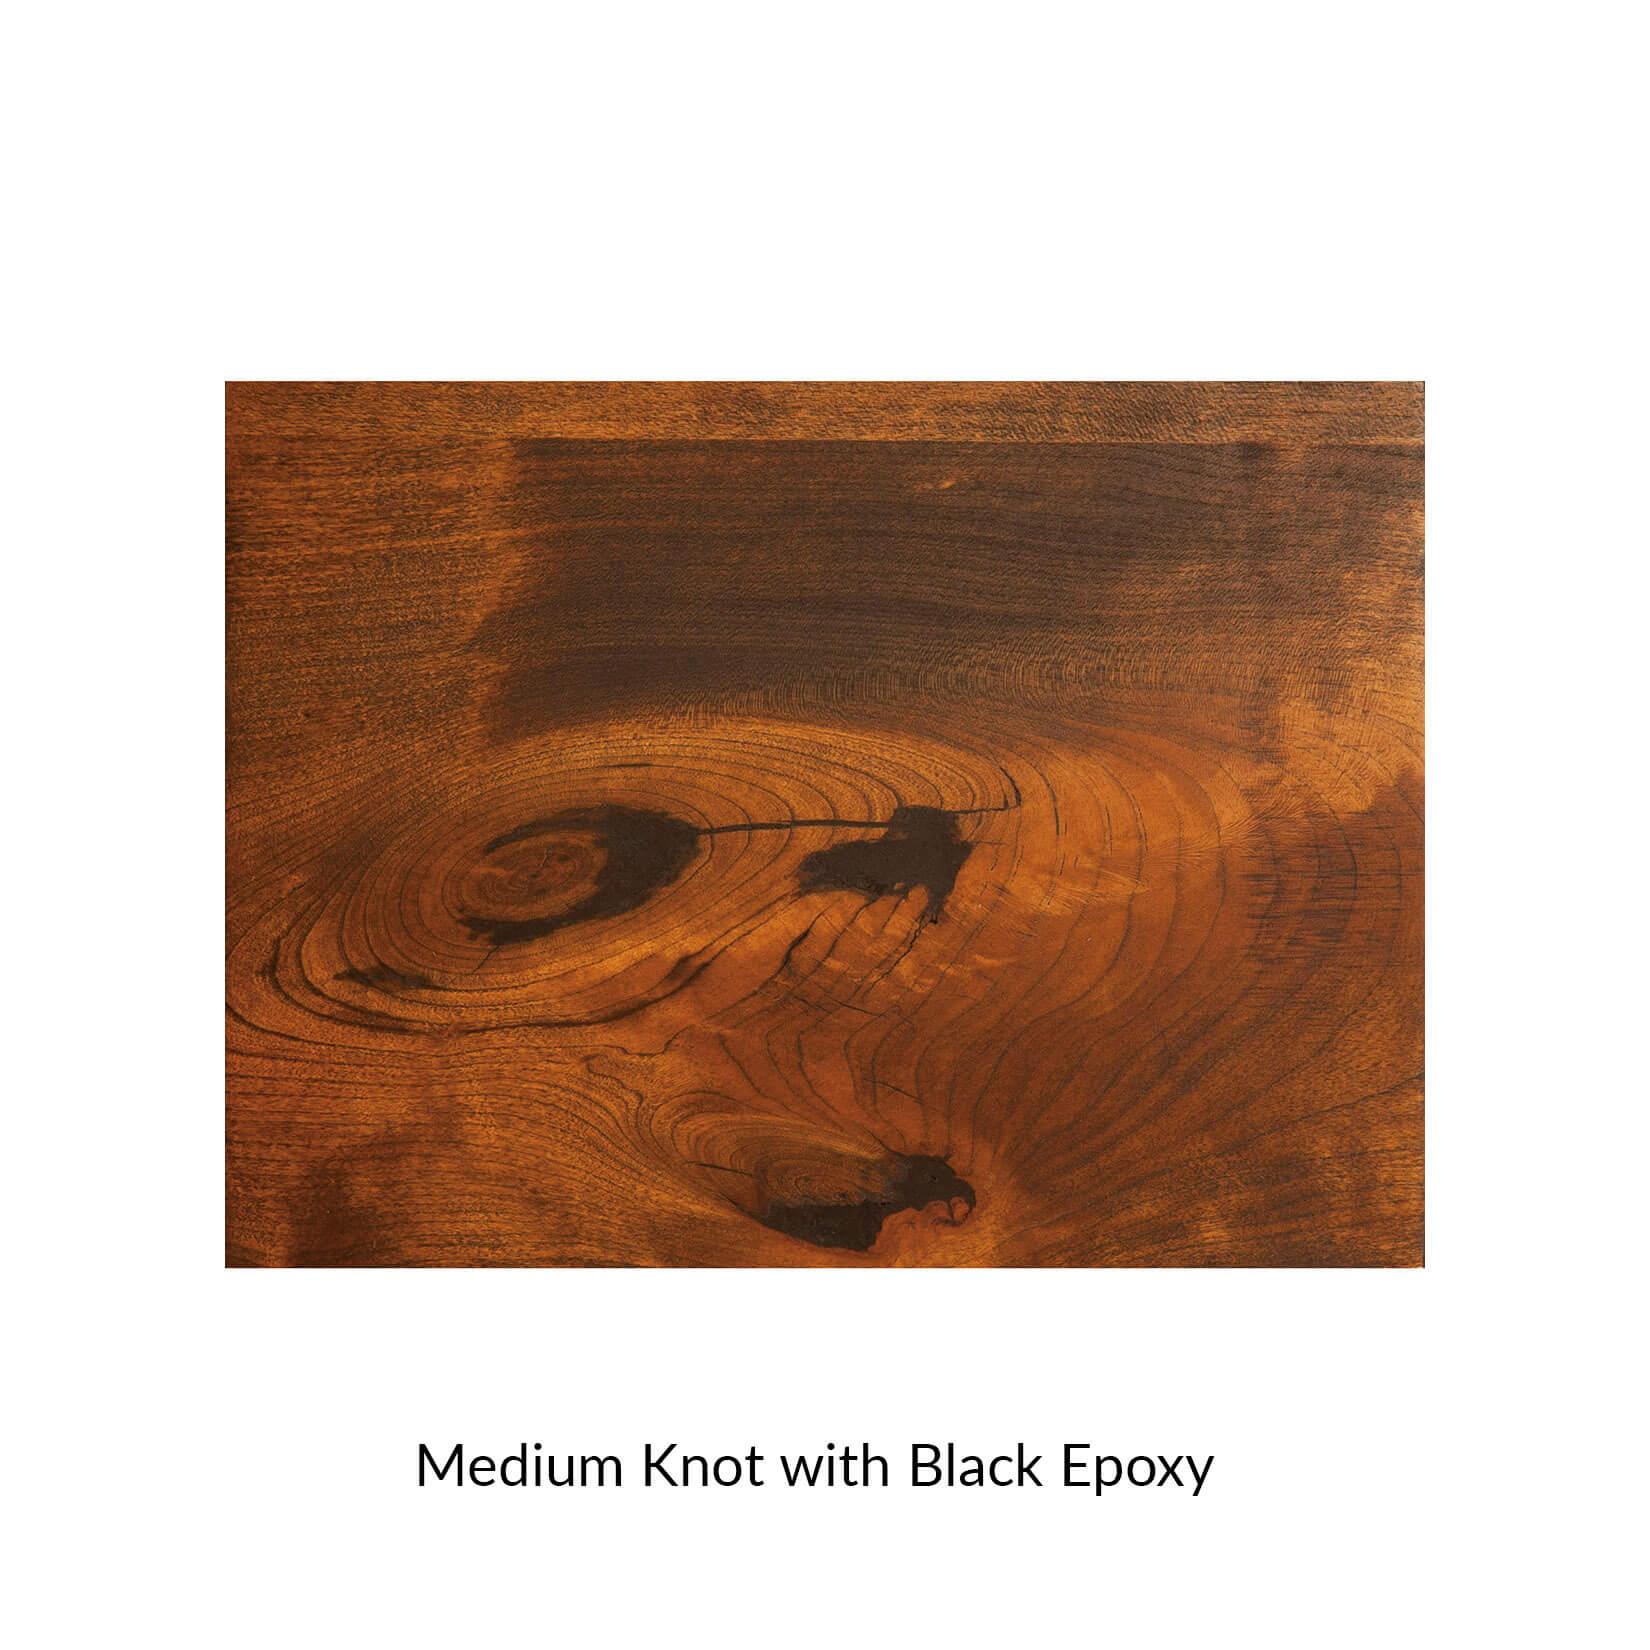 4.-medium-knot-with-black-epoxy.jpg